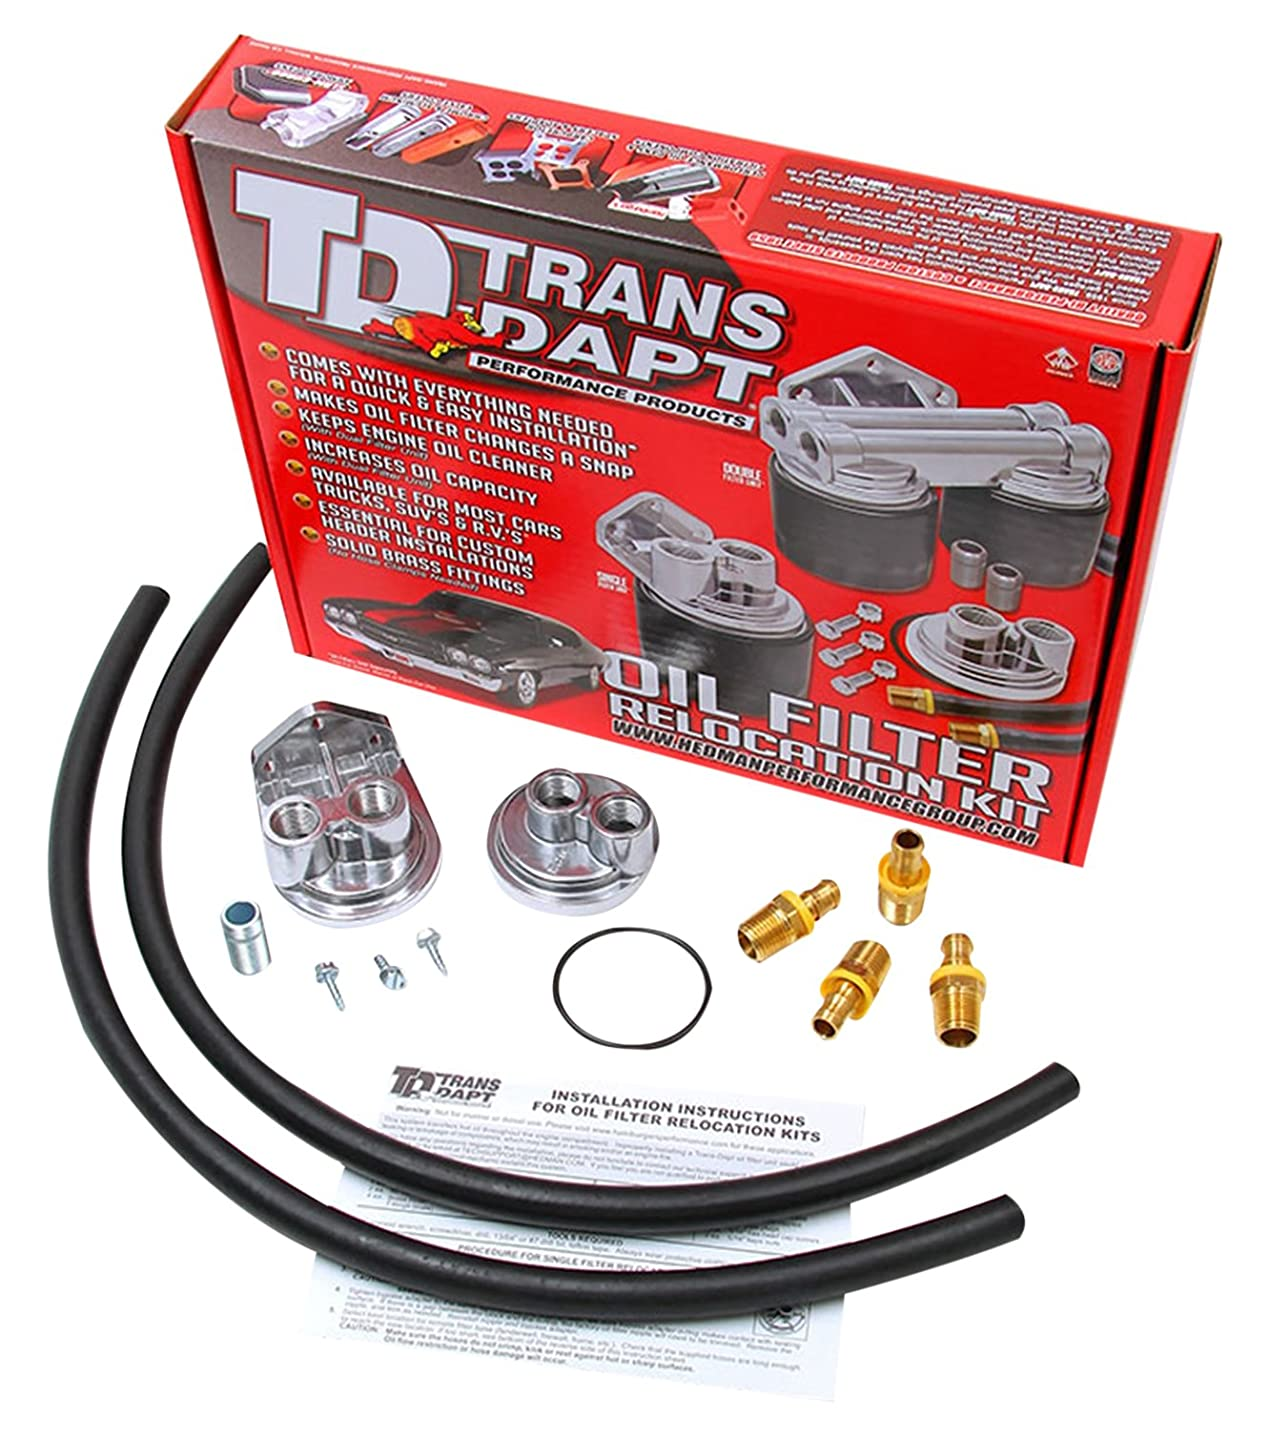 Trans-Dapt 1122 Oil Filter Relocation Kit